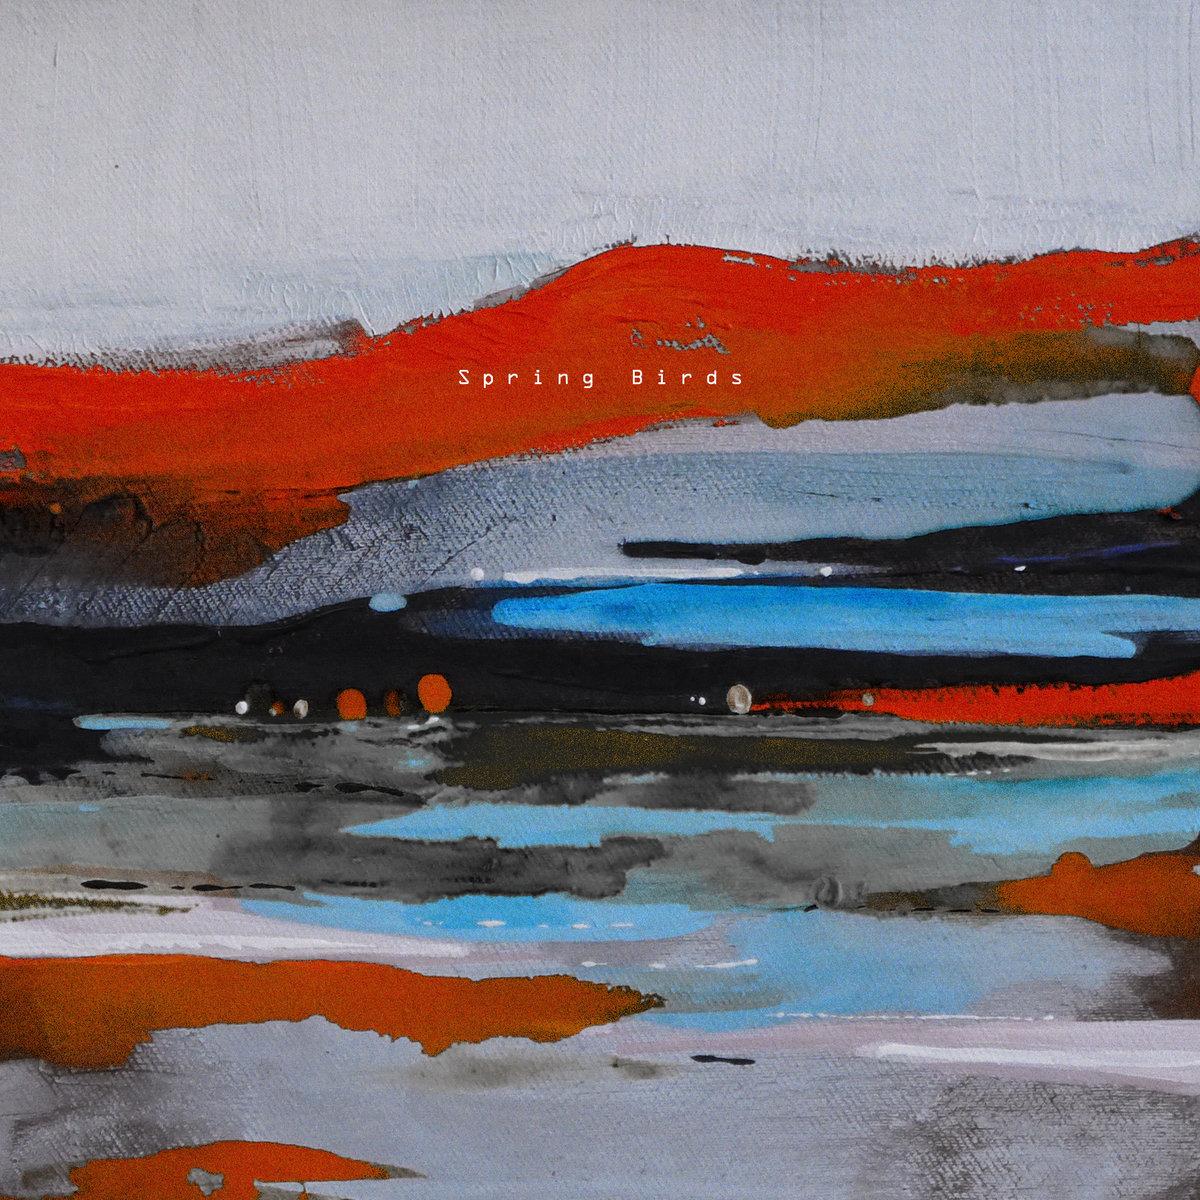 Montagne - Spring Birds [Singles] (2018)